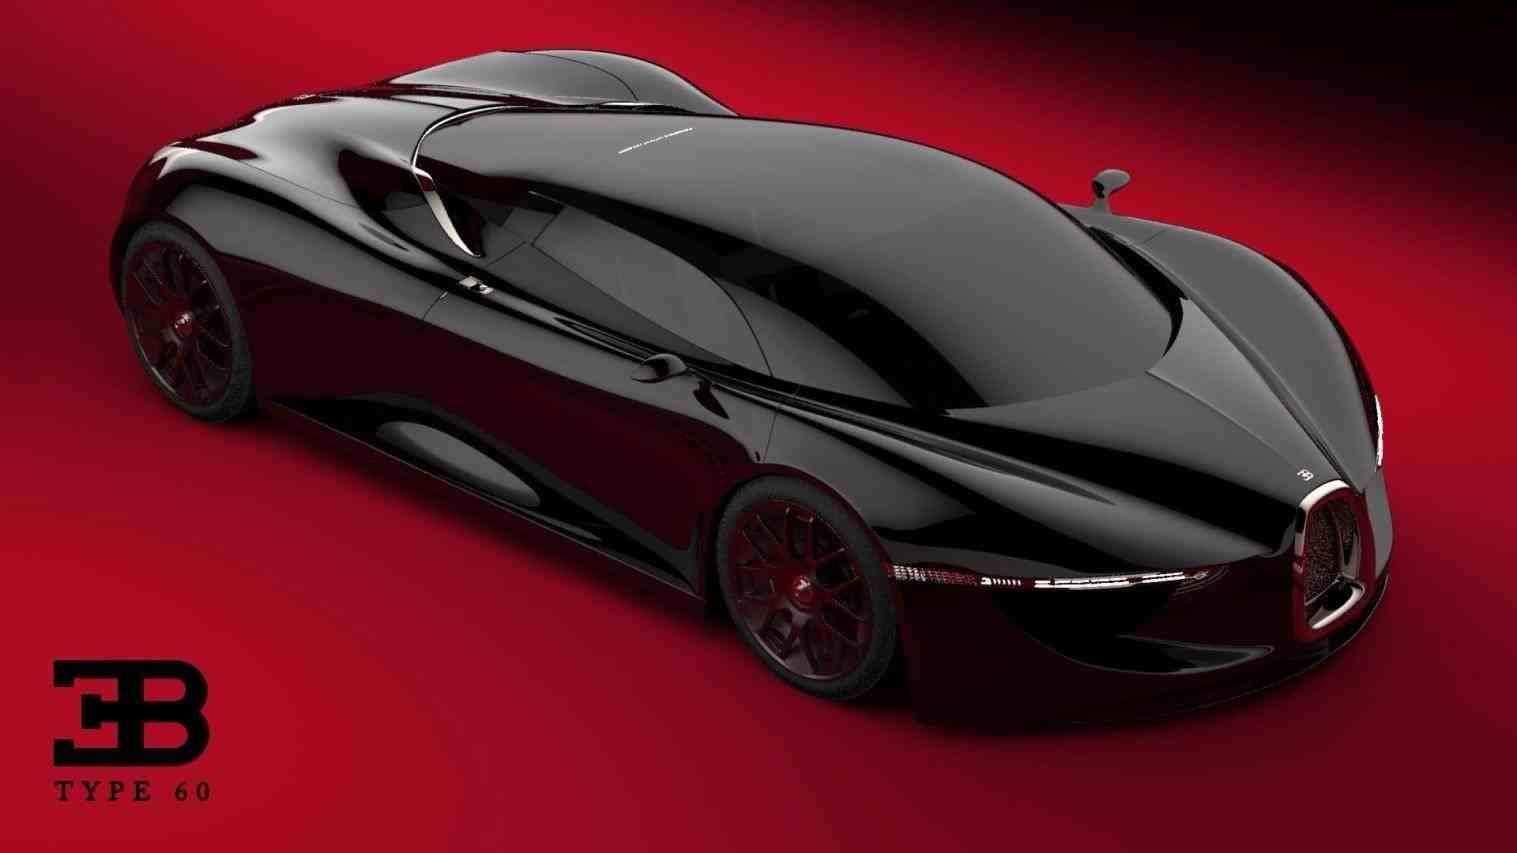 16 New 2020 Bugatti Veyron Rumors by 2020 Bugatti Veyron